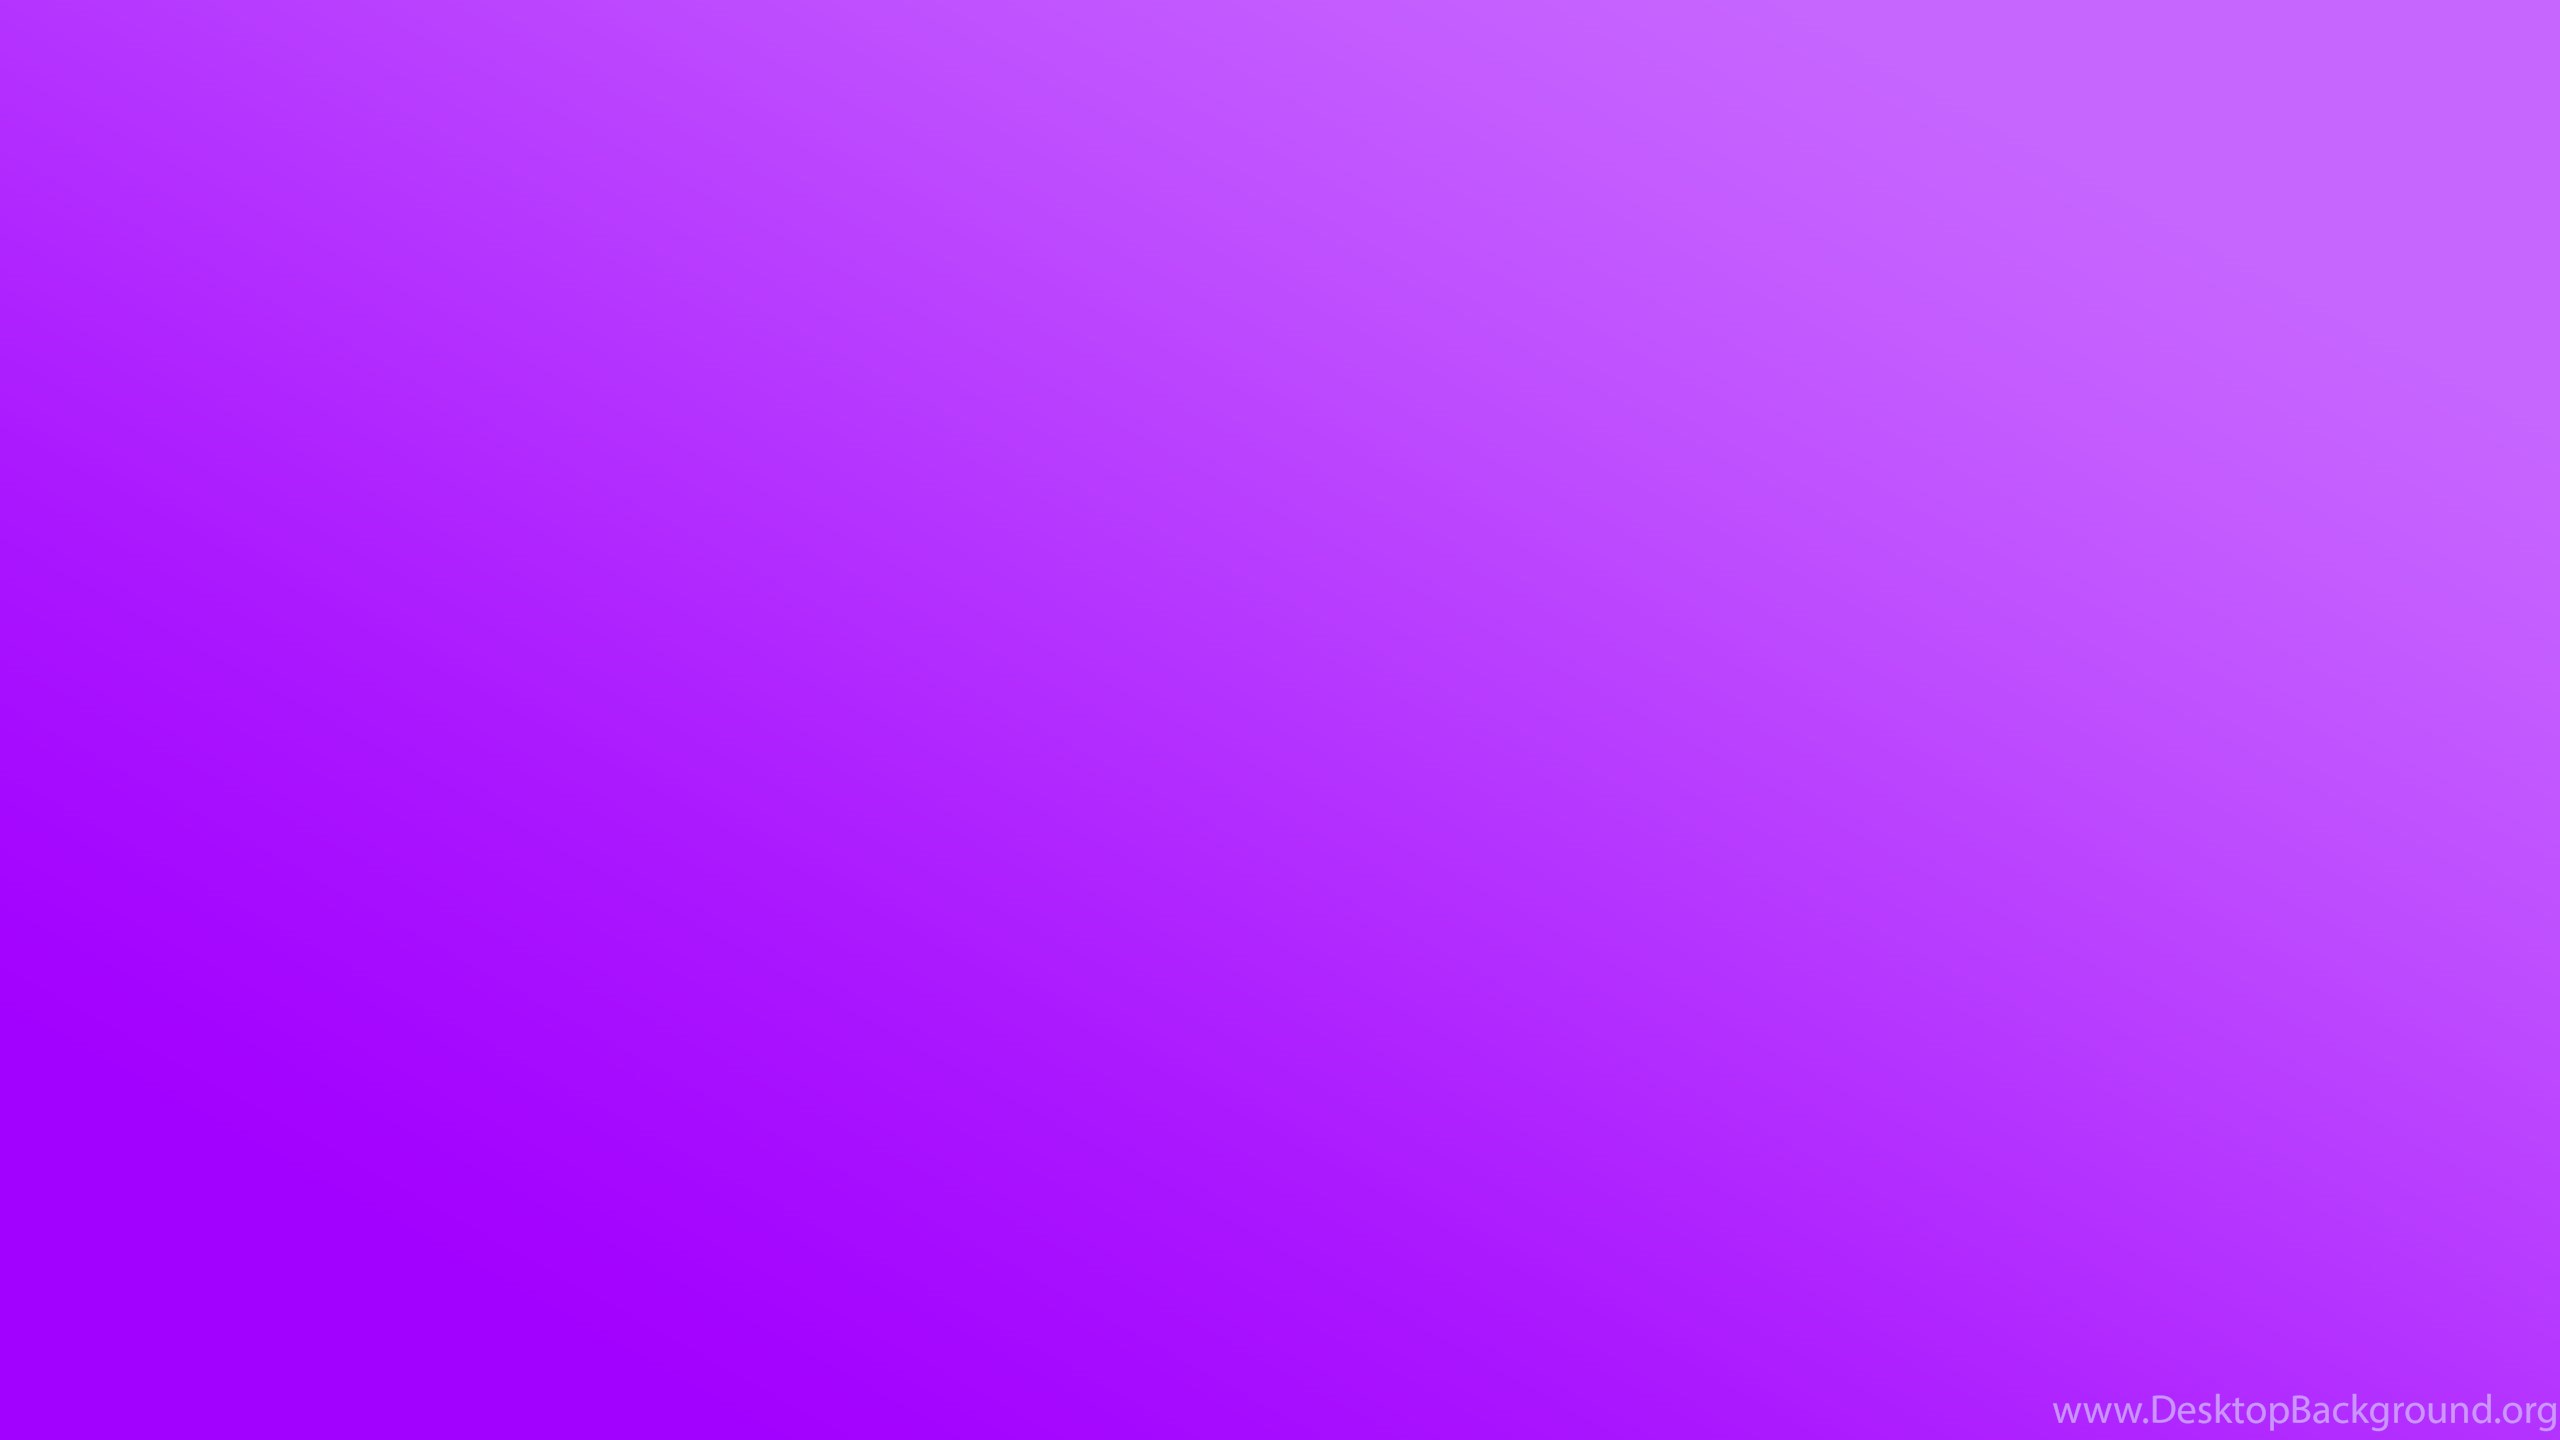 24 HD Solid Color Wallpapers HDWallSource Desktop Background